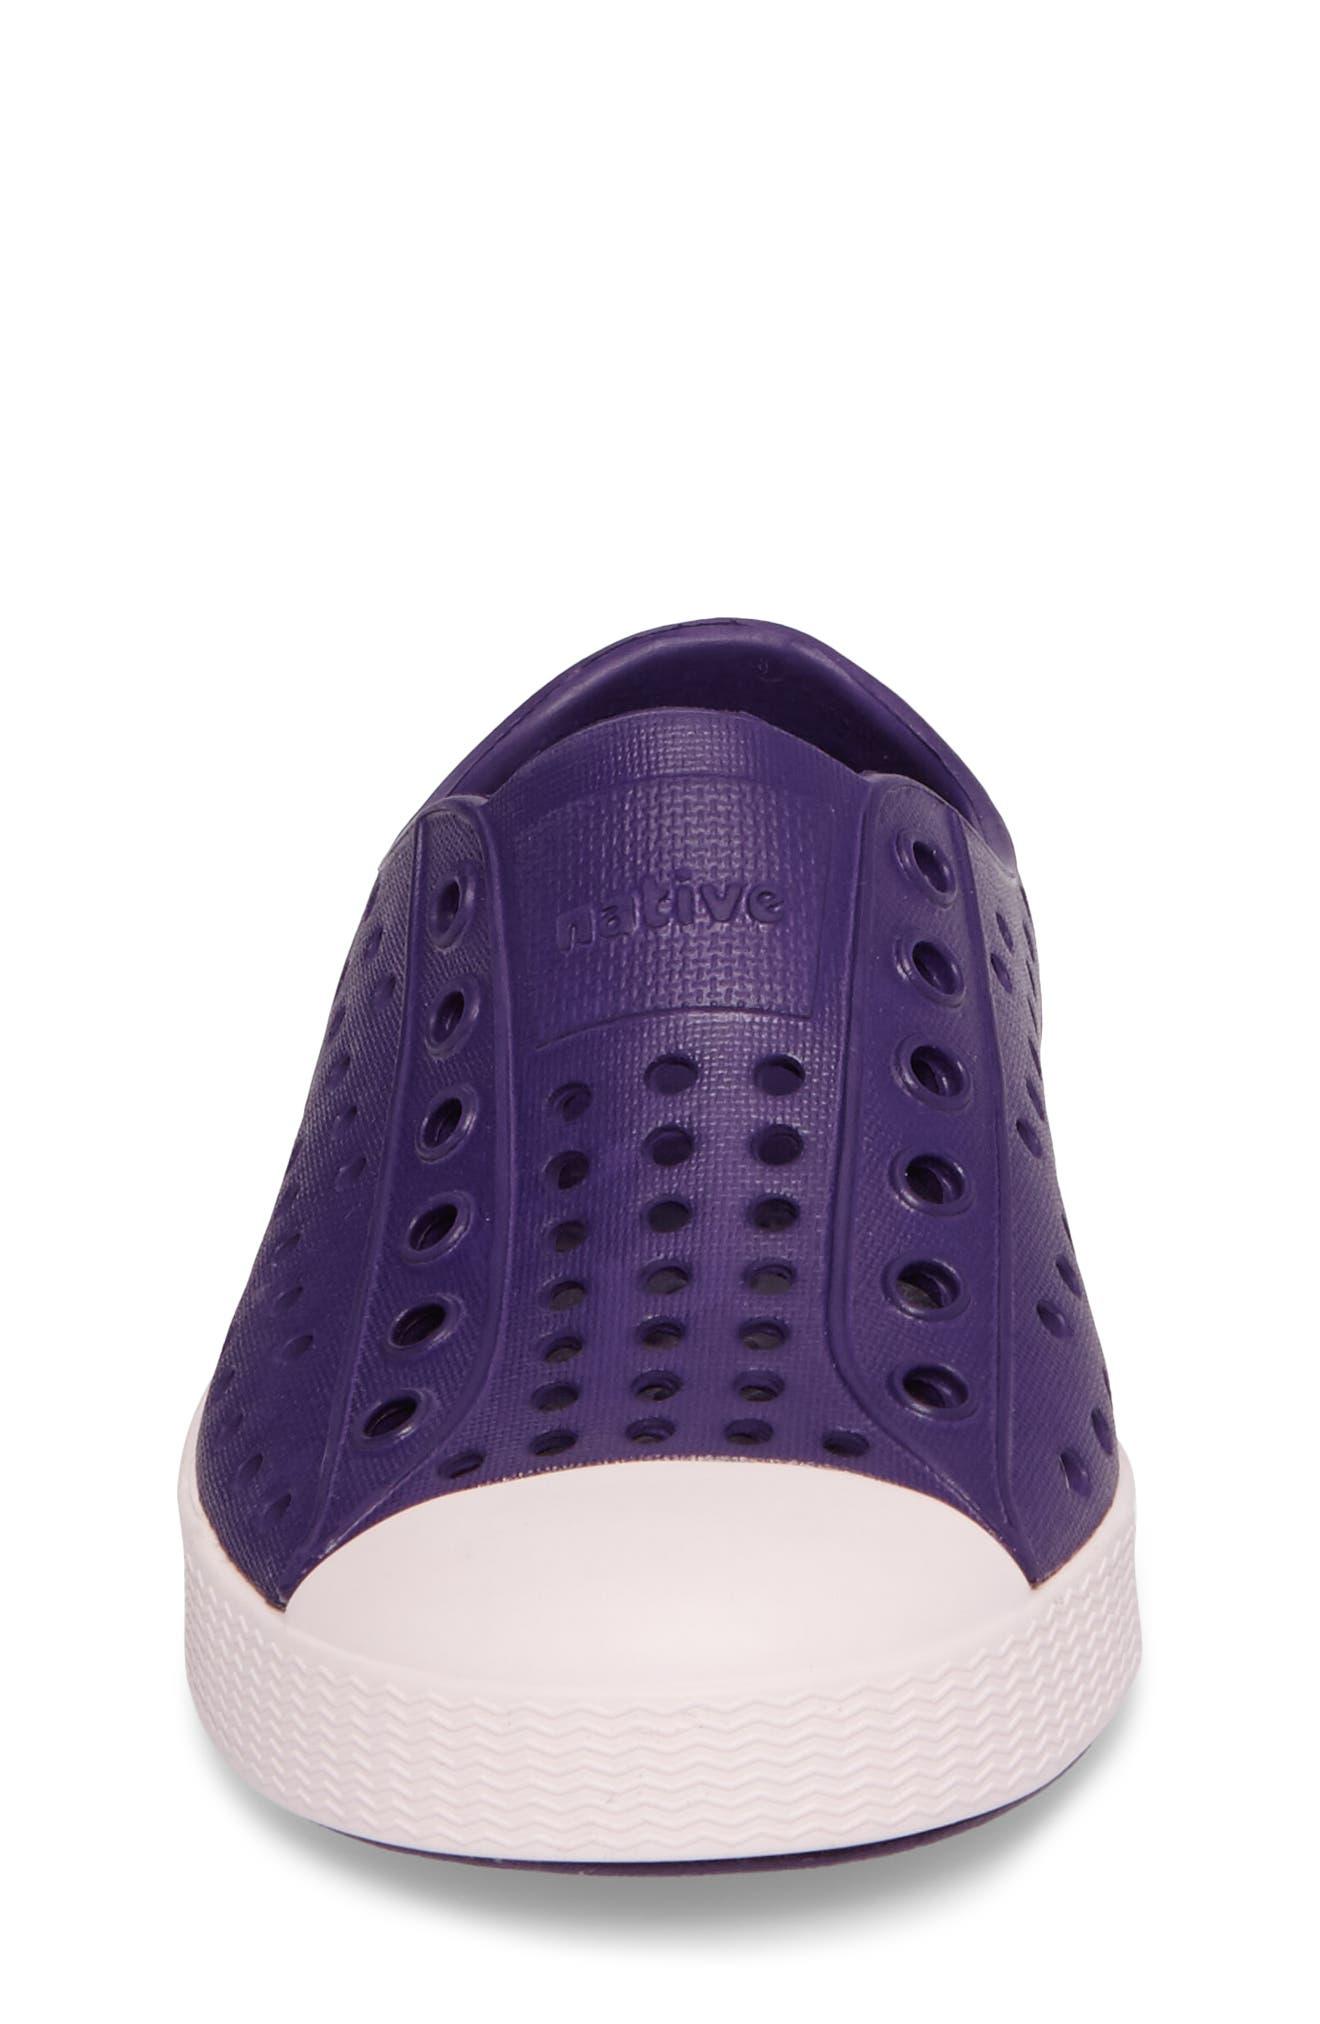 'Jefferson' Water Friendly Slip-On Sneaker,                             Alternate thumbnail 210, color,